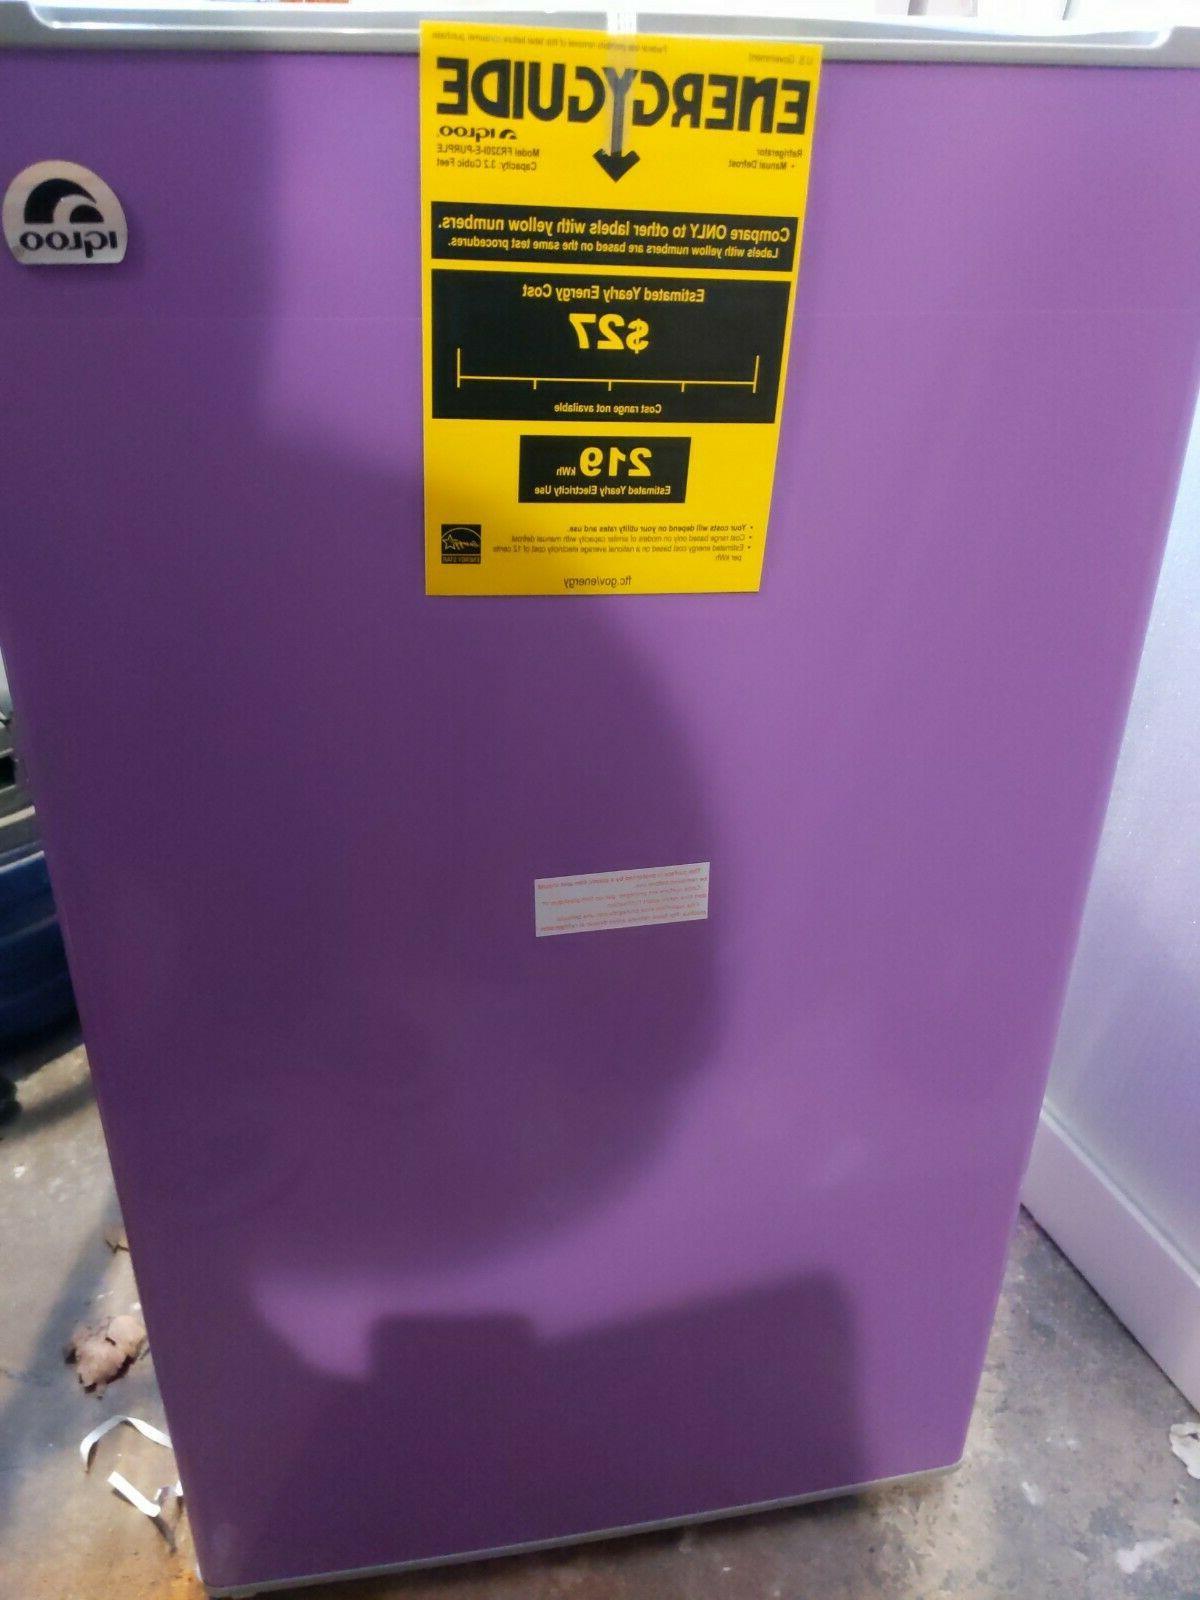 igloo refrigerator purple open box cosmetic damage